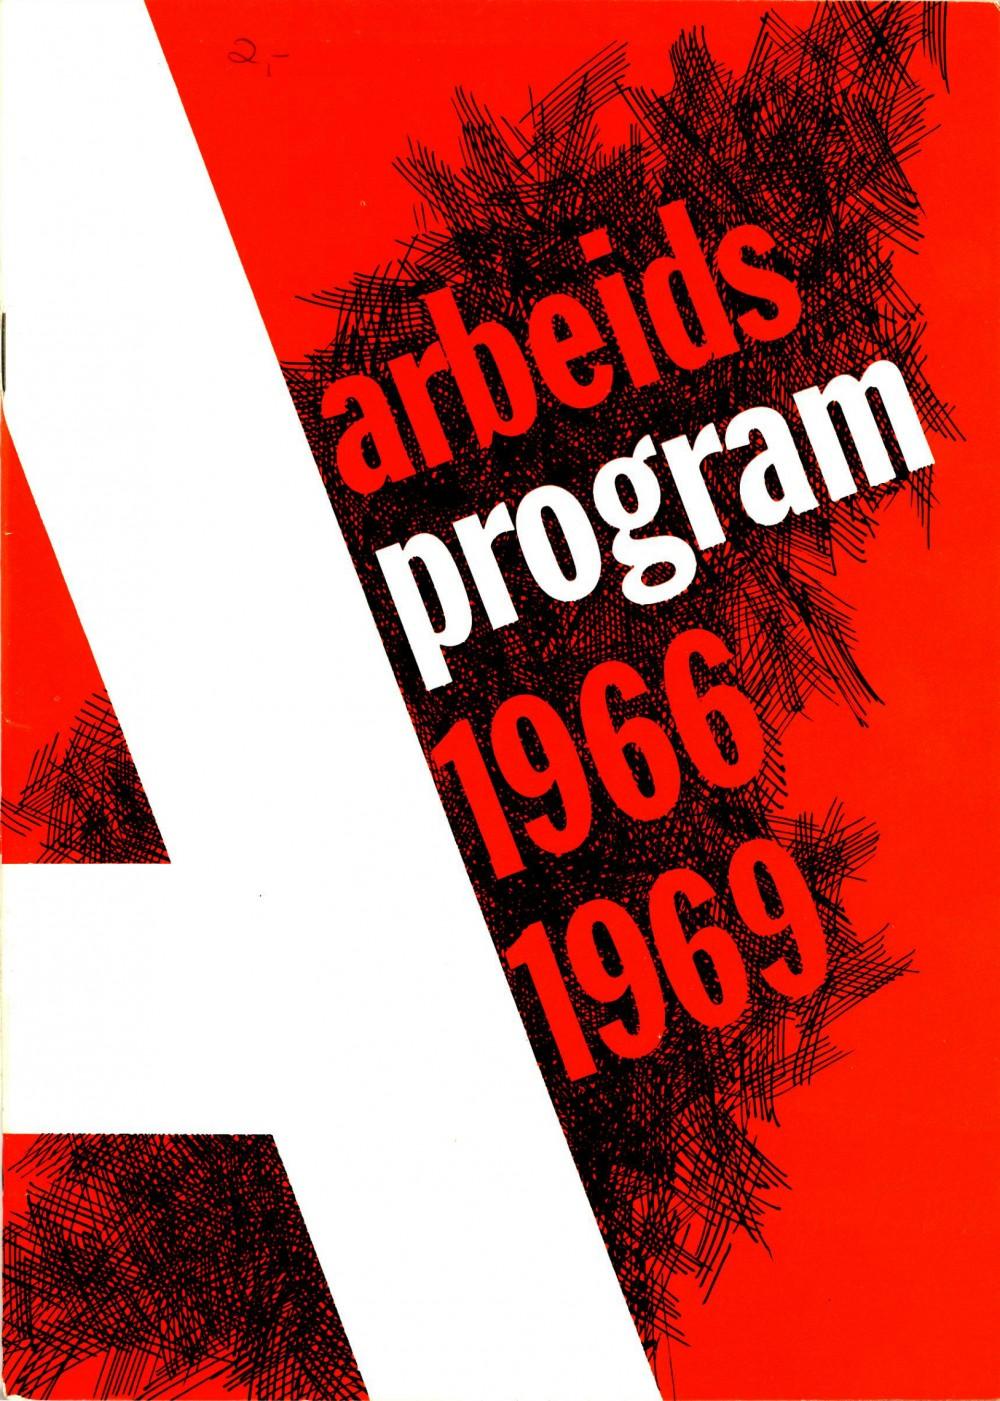 Det Norske Arbeiderparti - Arbeidsprogram 1966-1969